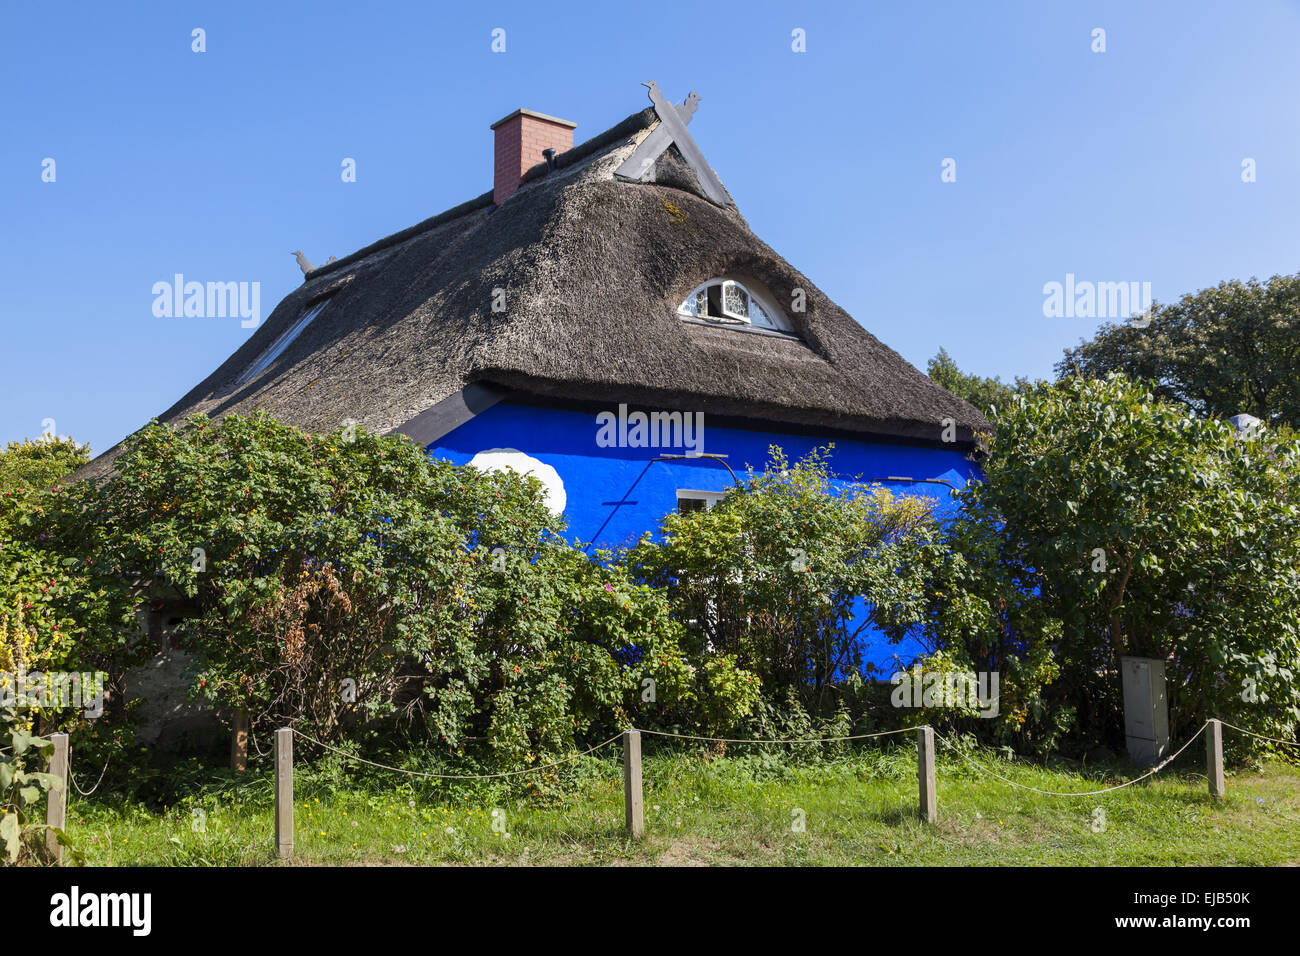 The Blue Barn on Hiddensee Stock Photo